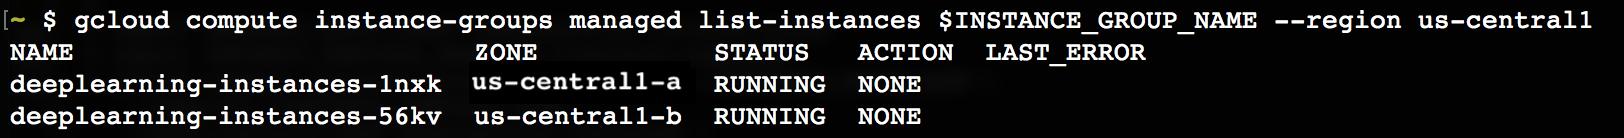 Screenshot of the running instance